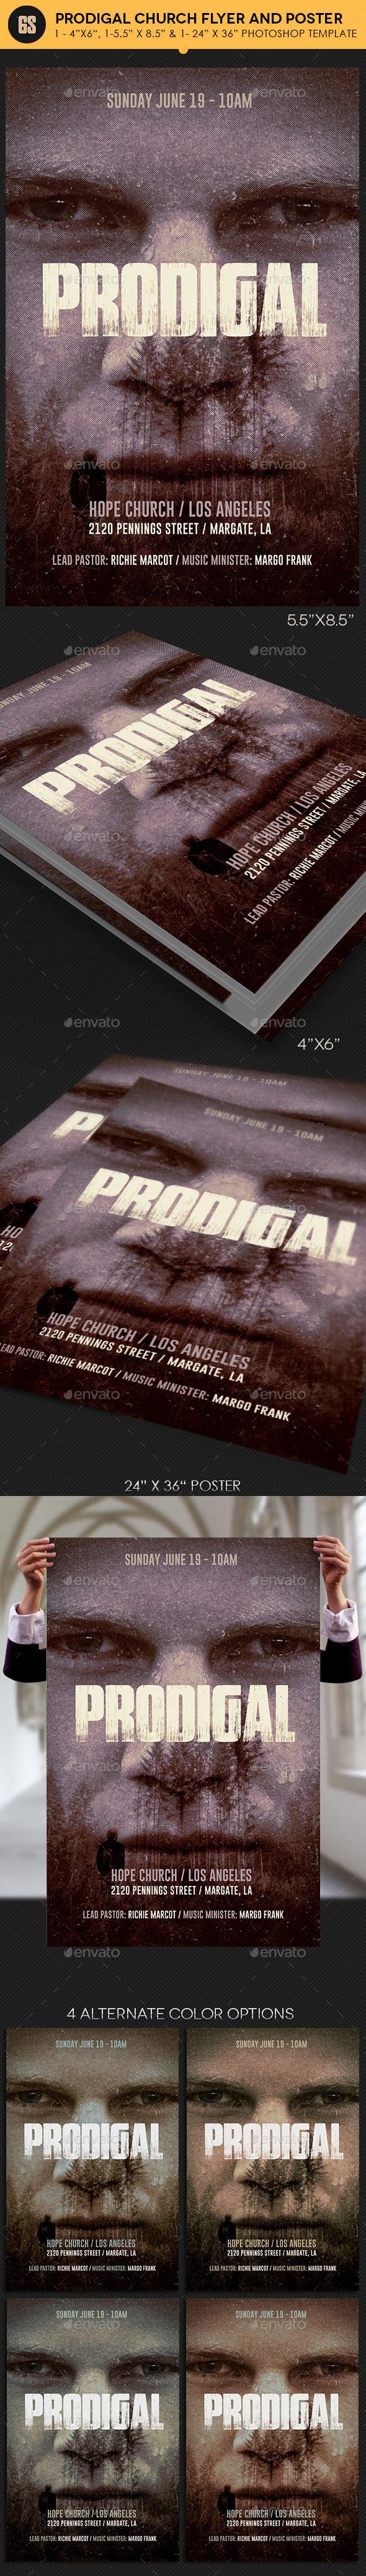 Prodigal Church Flyer Poster Template - Church Flyers